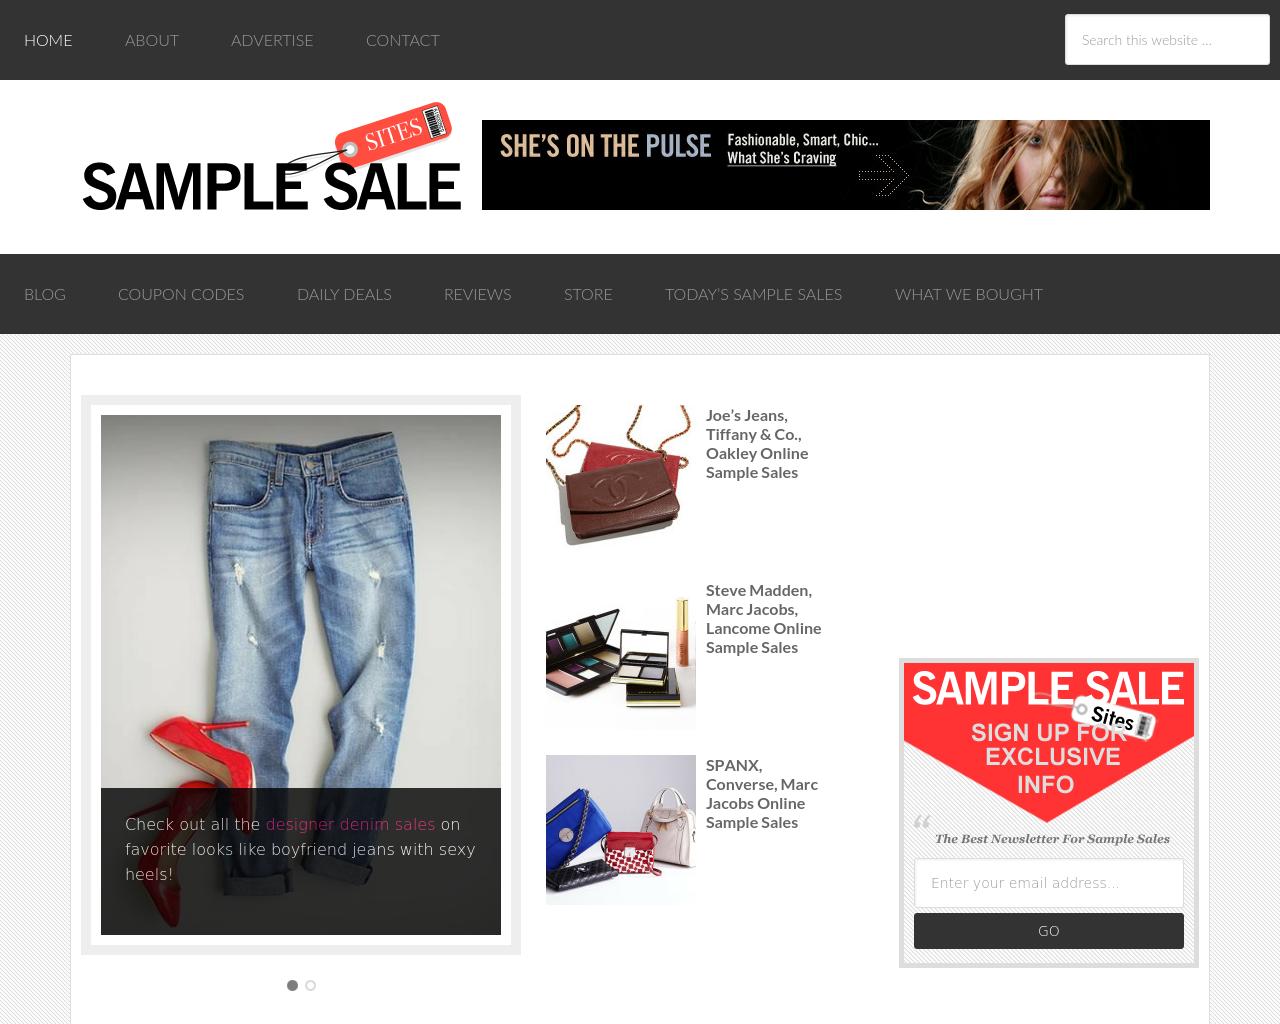 Sample-Sale-Sites-Advertising-Reviews-Pricing